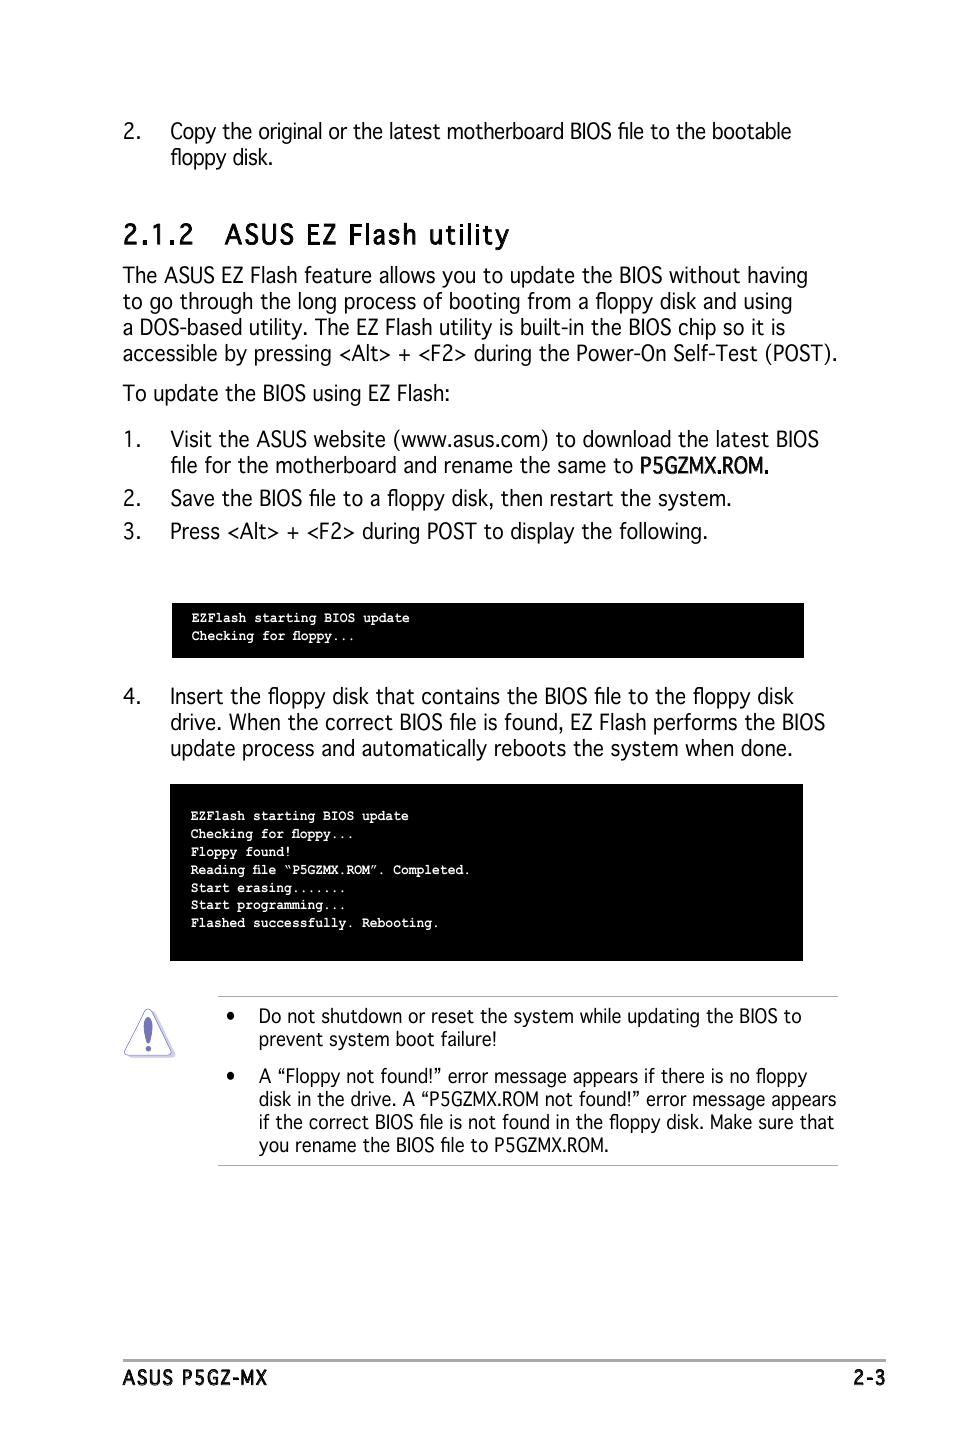 2 asus ez flash utility | Asus P5GZ-MX User Manual | Page 49